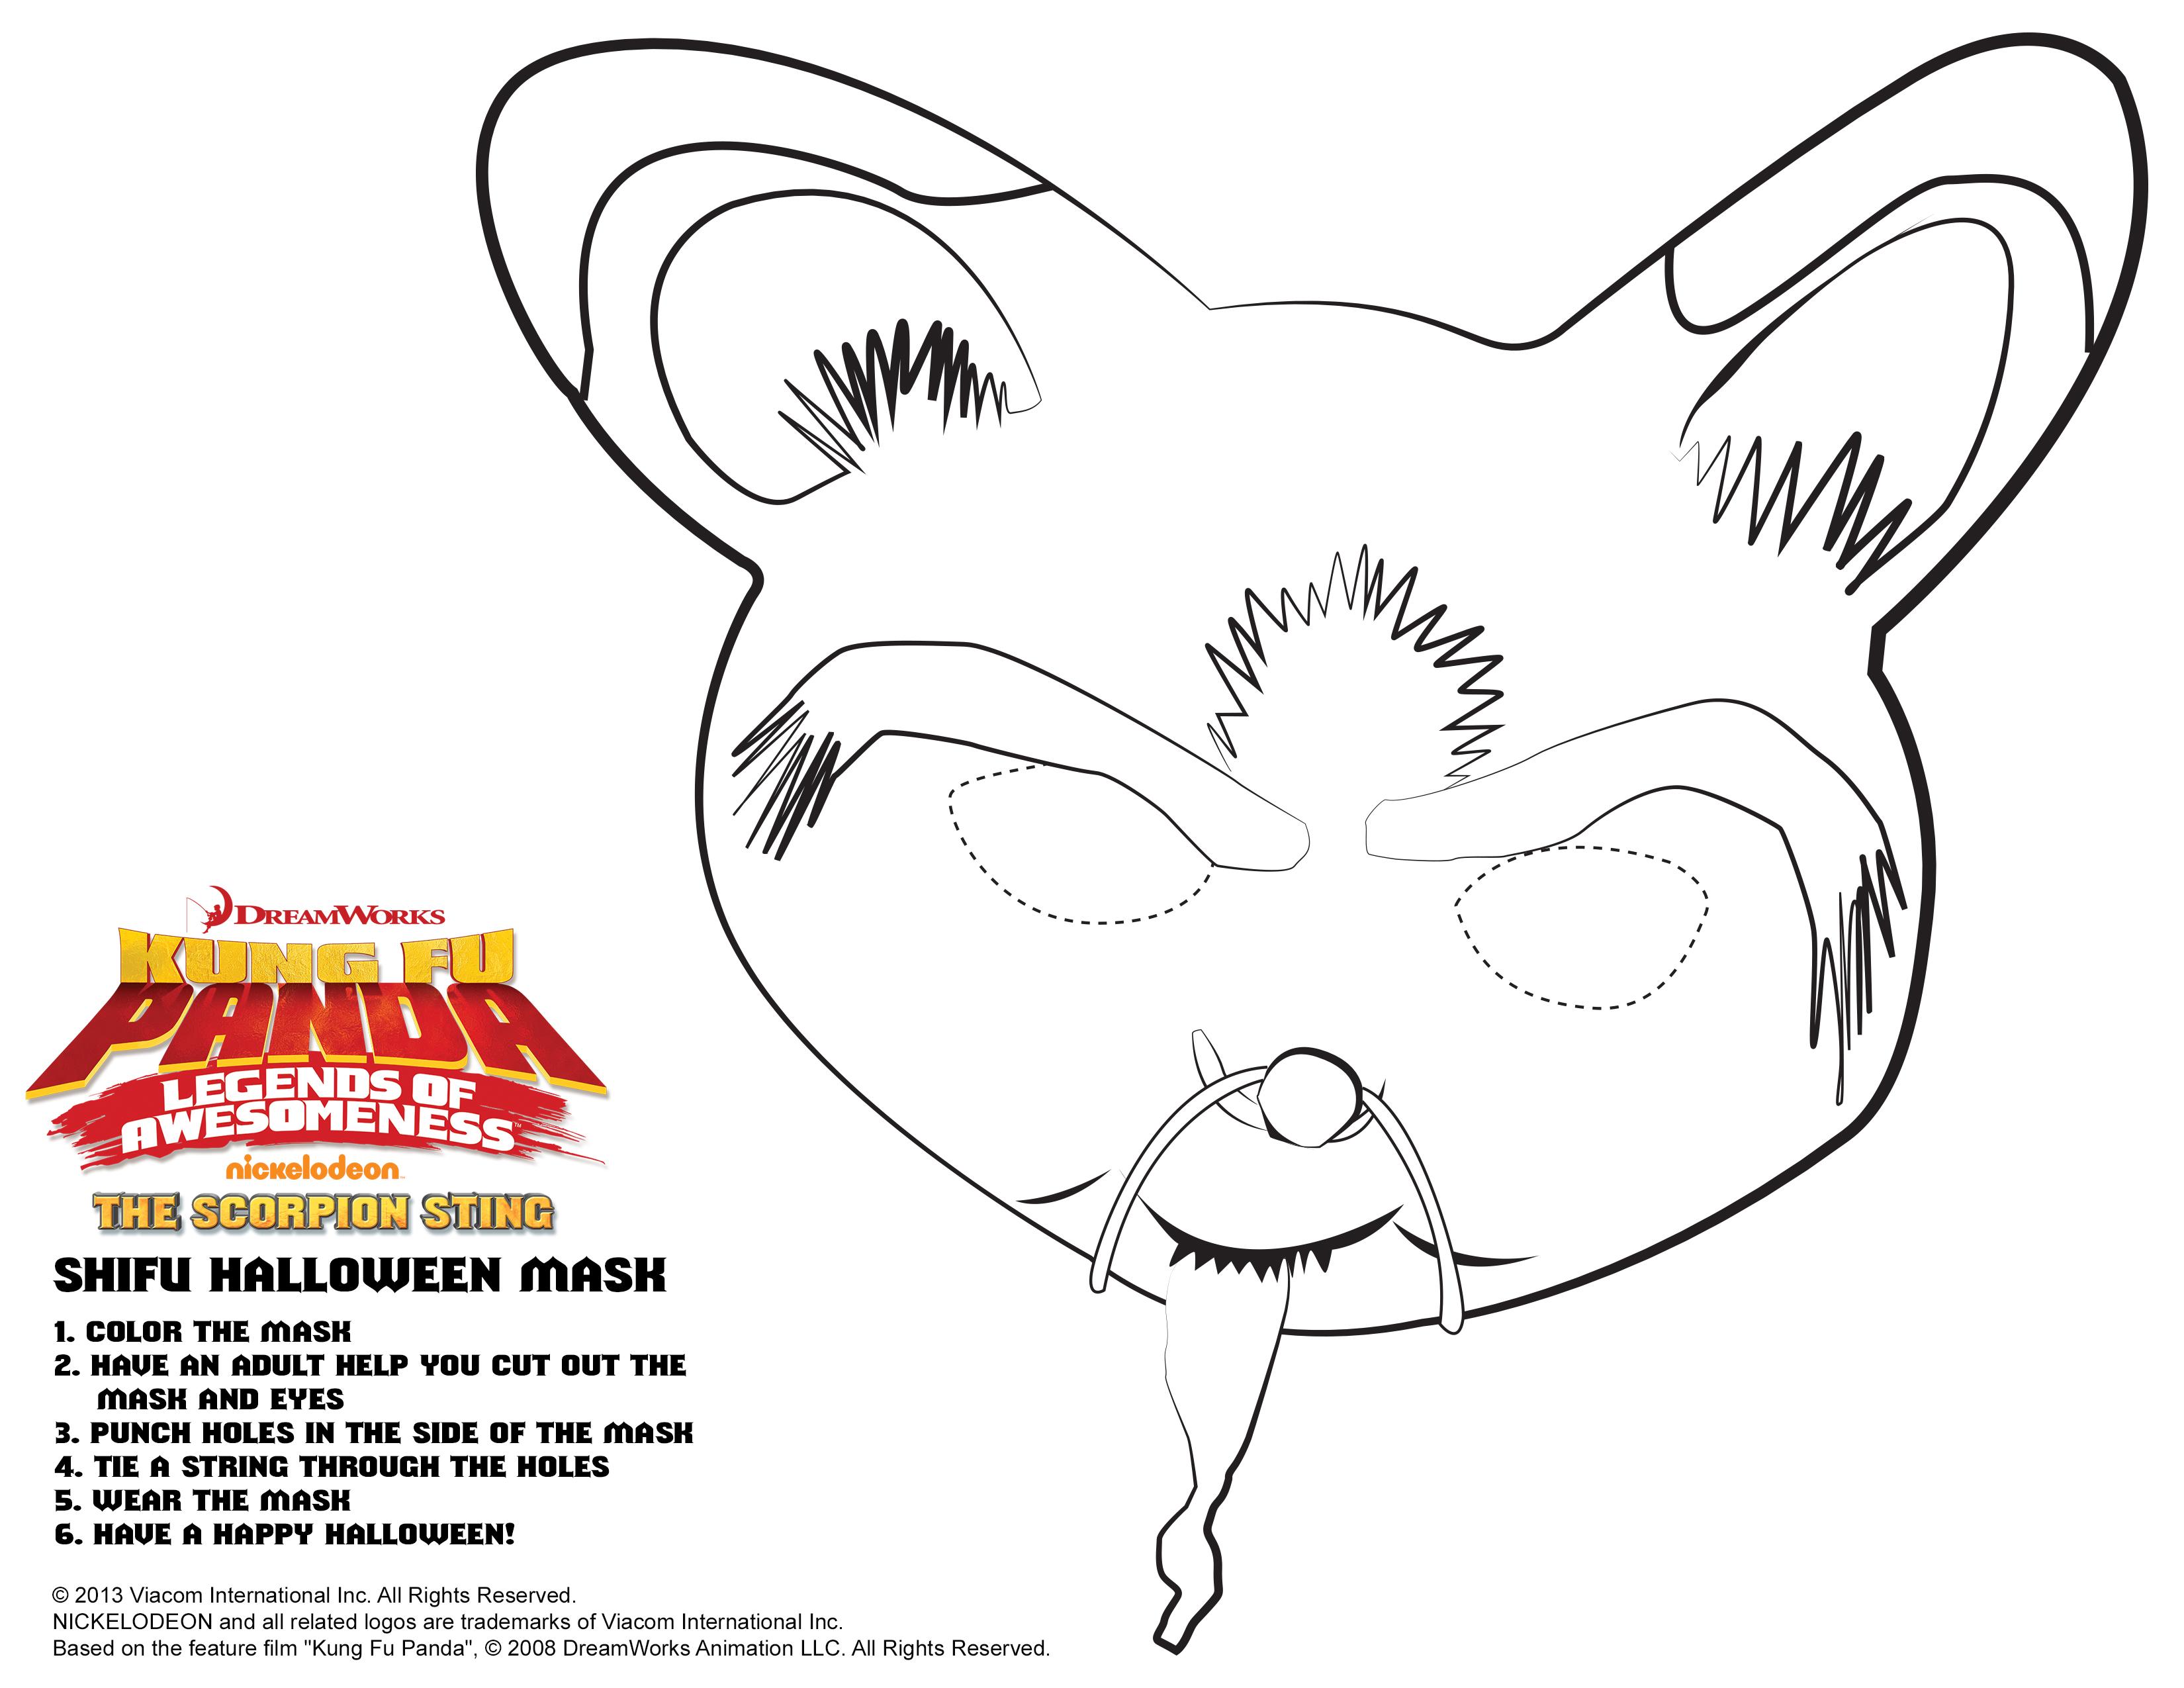 Printable coloring pages kung fu panda 2 - Kung Fu Panda Shifu Halloween Mask